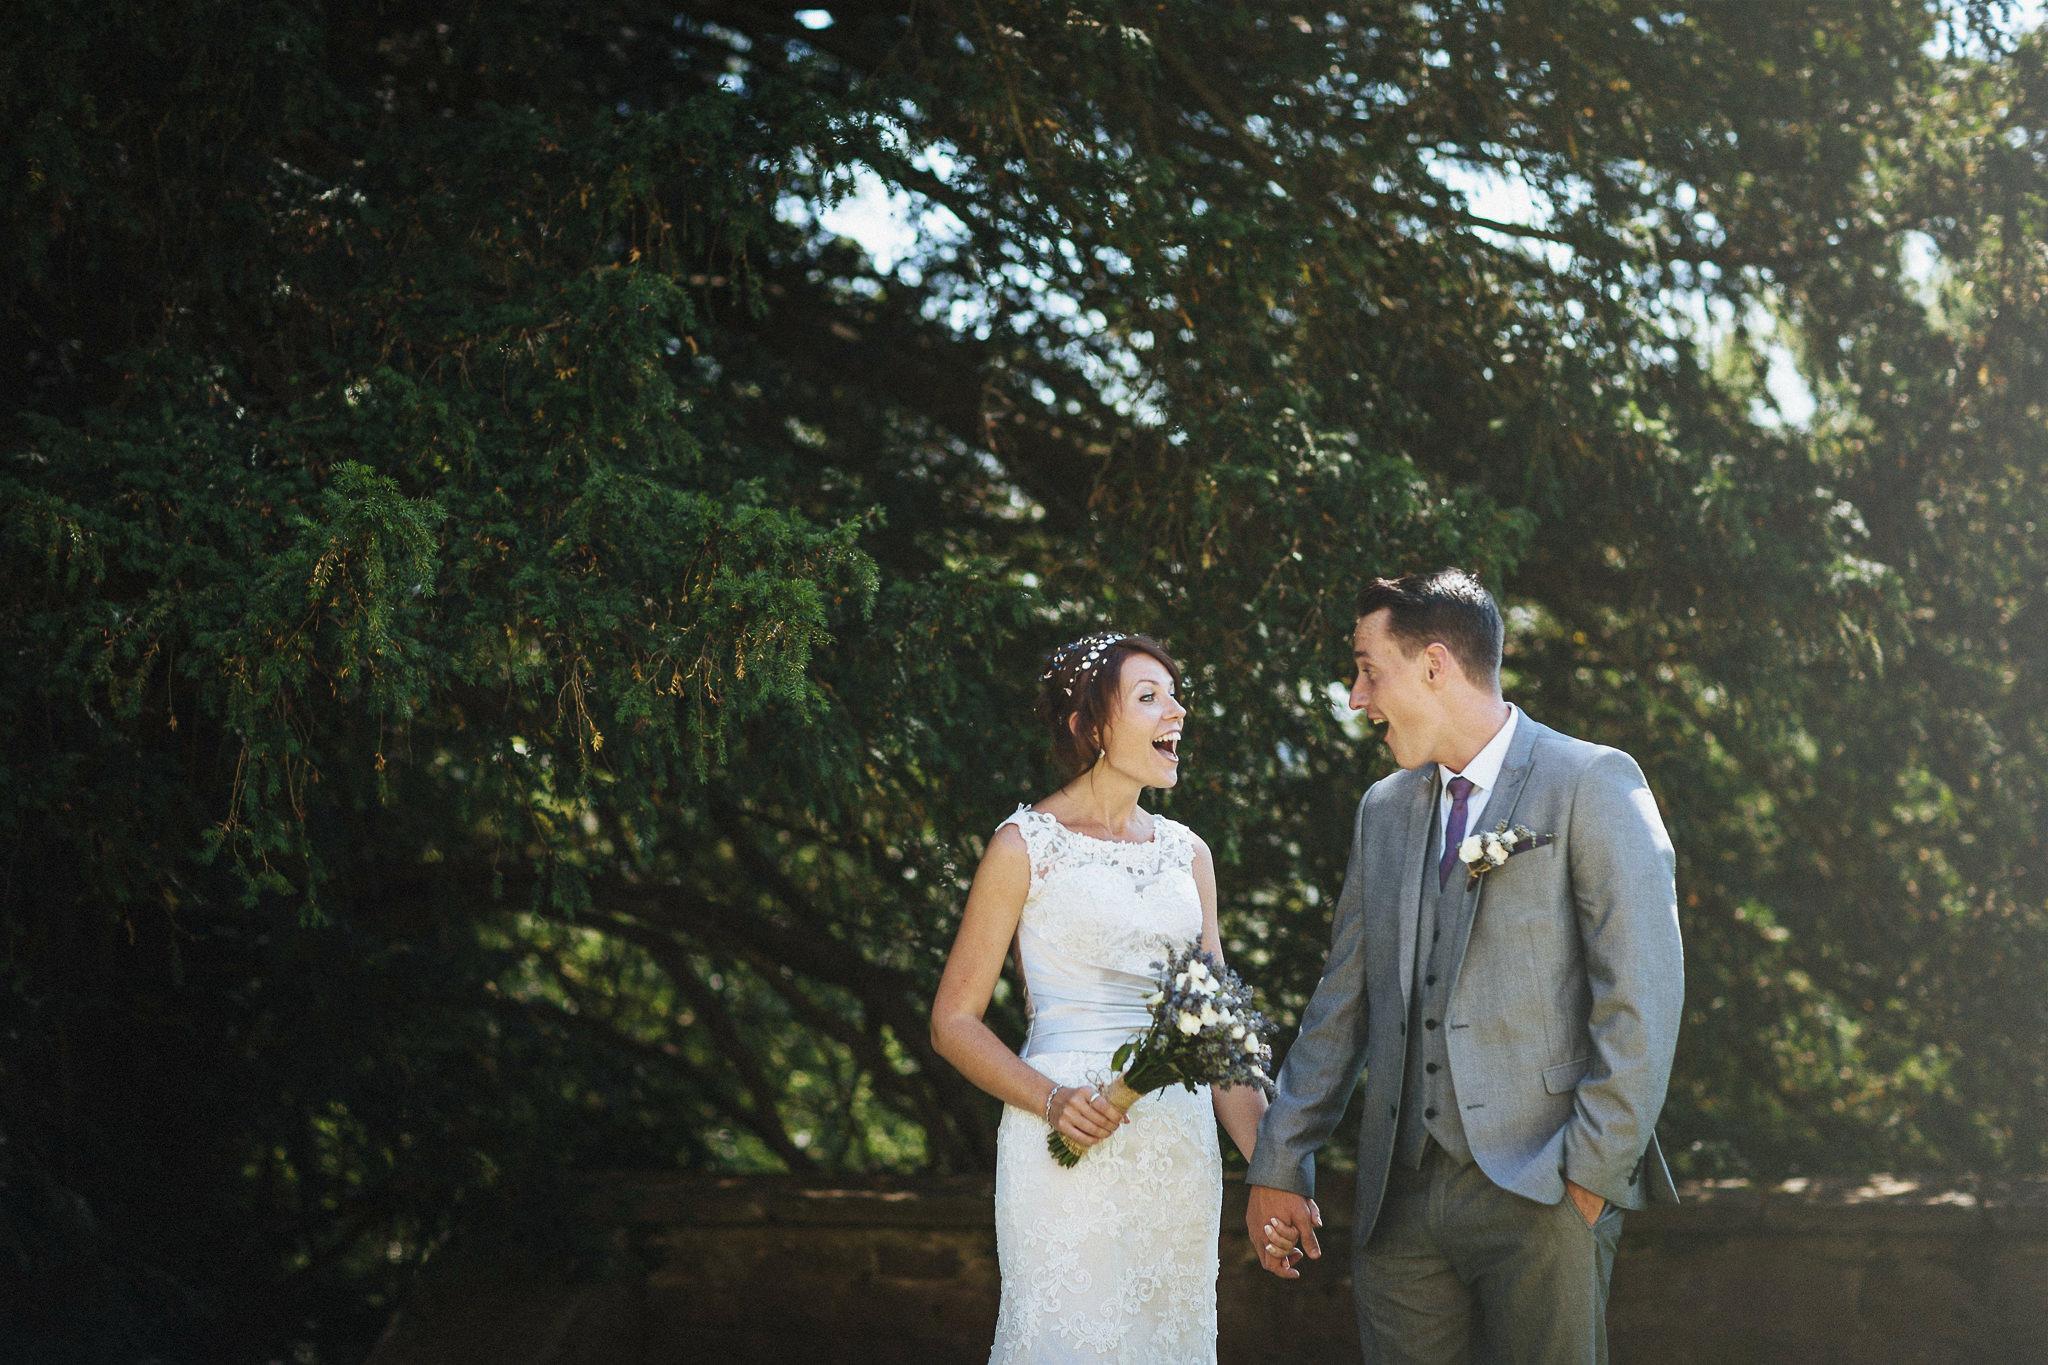 paul-marbrook-Caer-Llan-Wedding-Photographer-90065